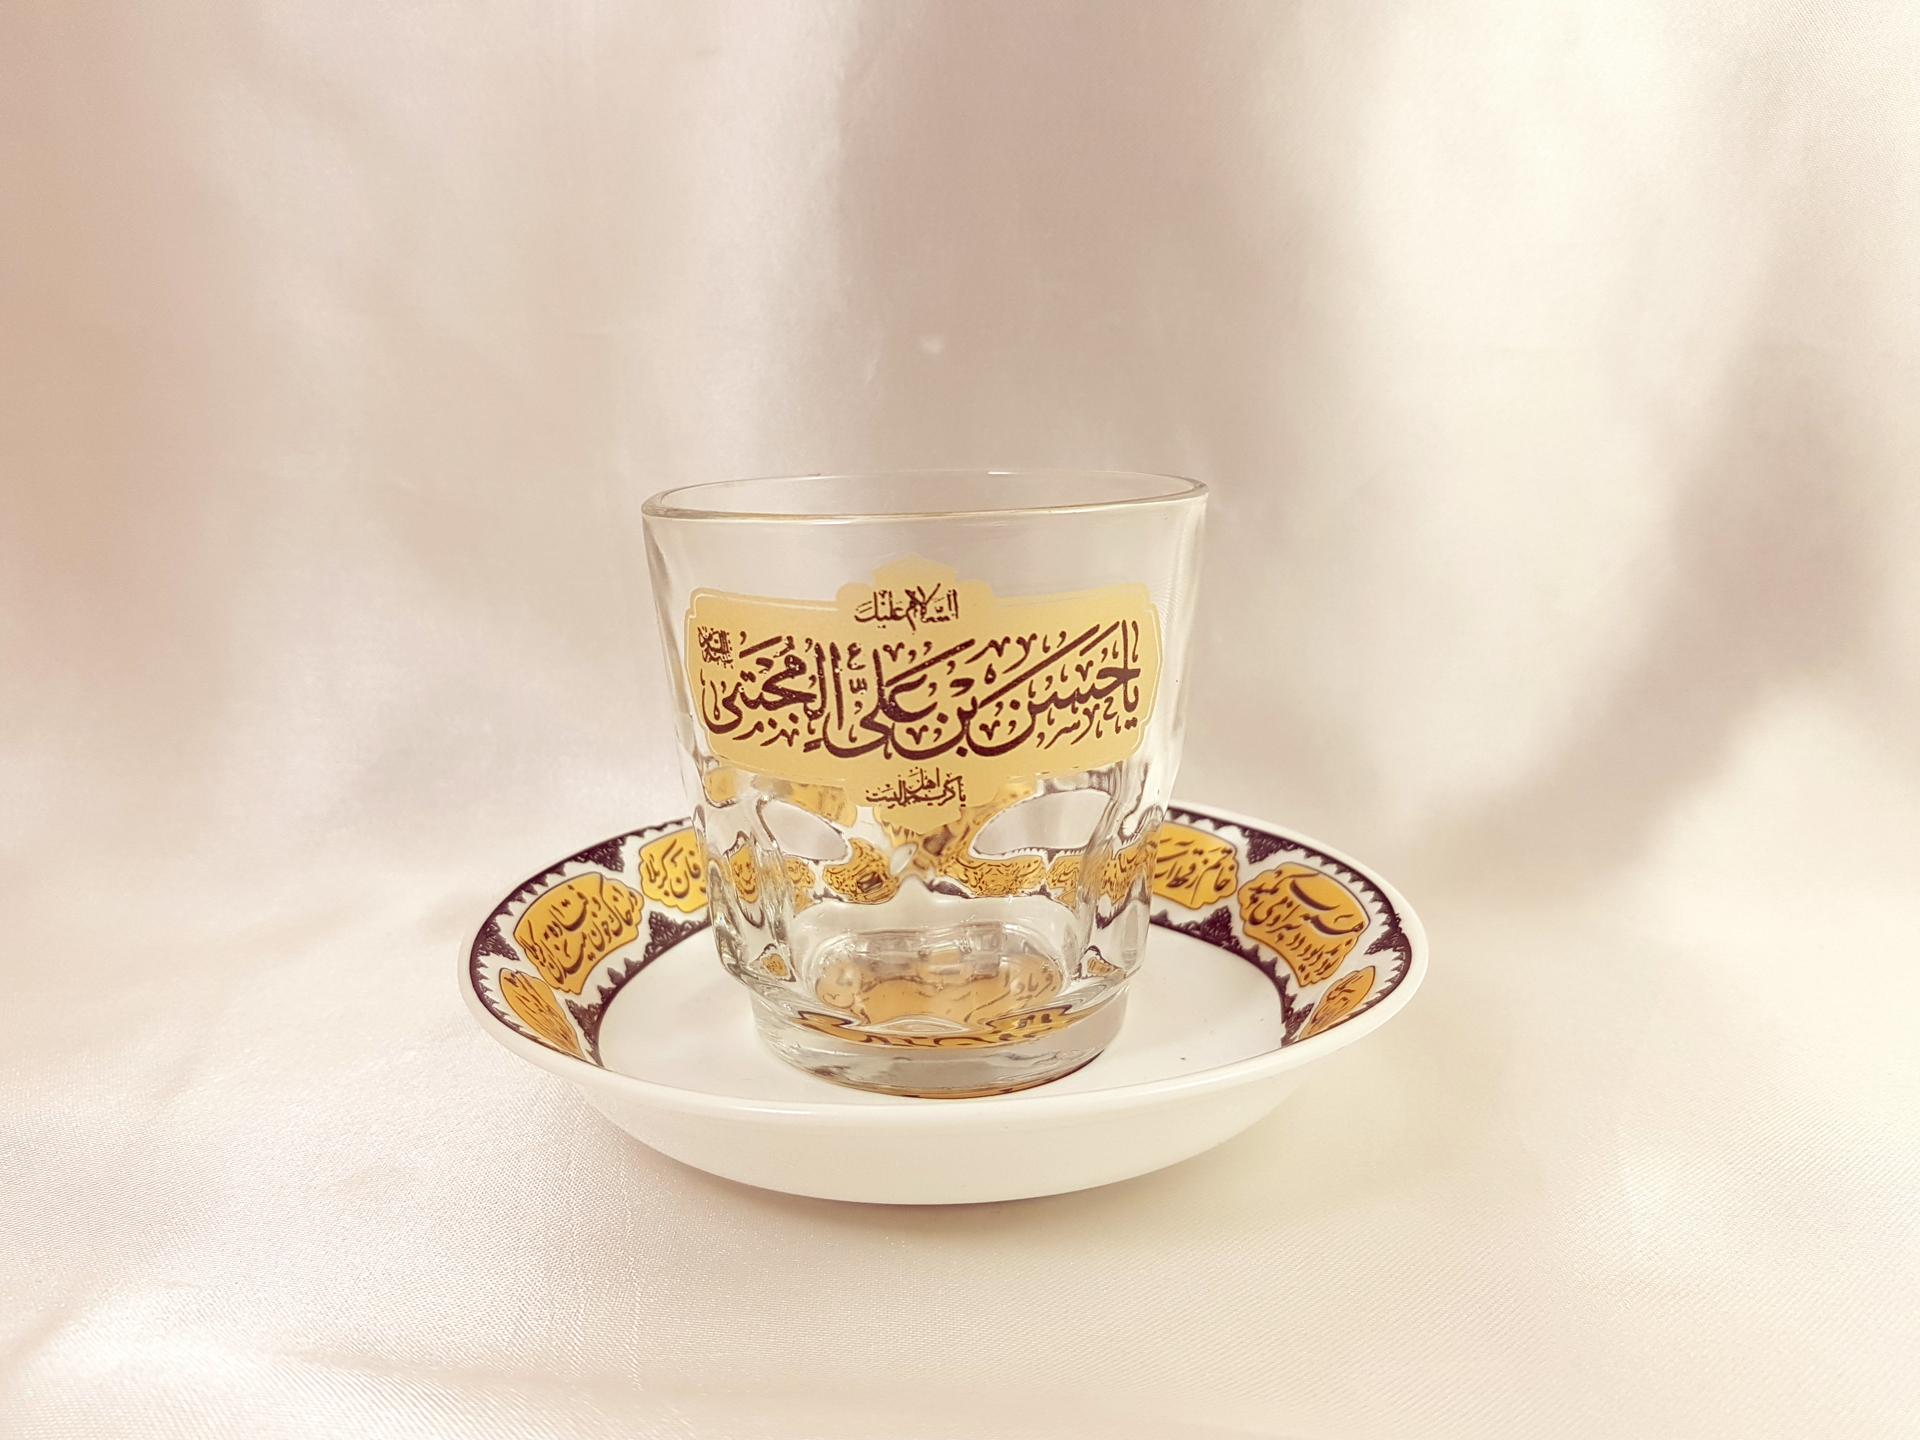 تصویر از استکان و نعلبکی نیم لیوان هیئت یا حسن بن علی المجتبی(ع)